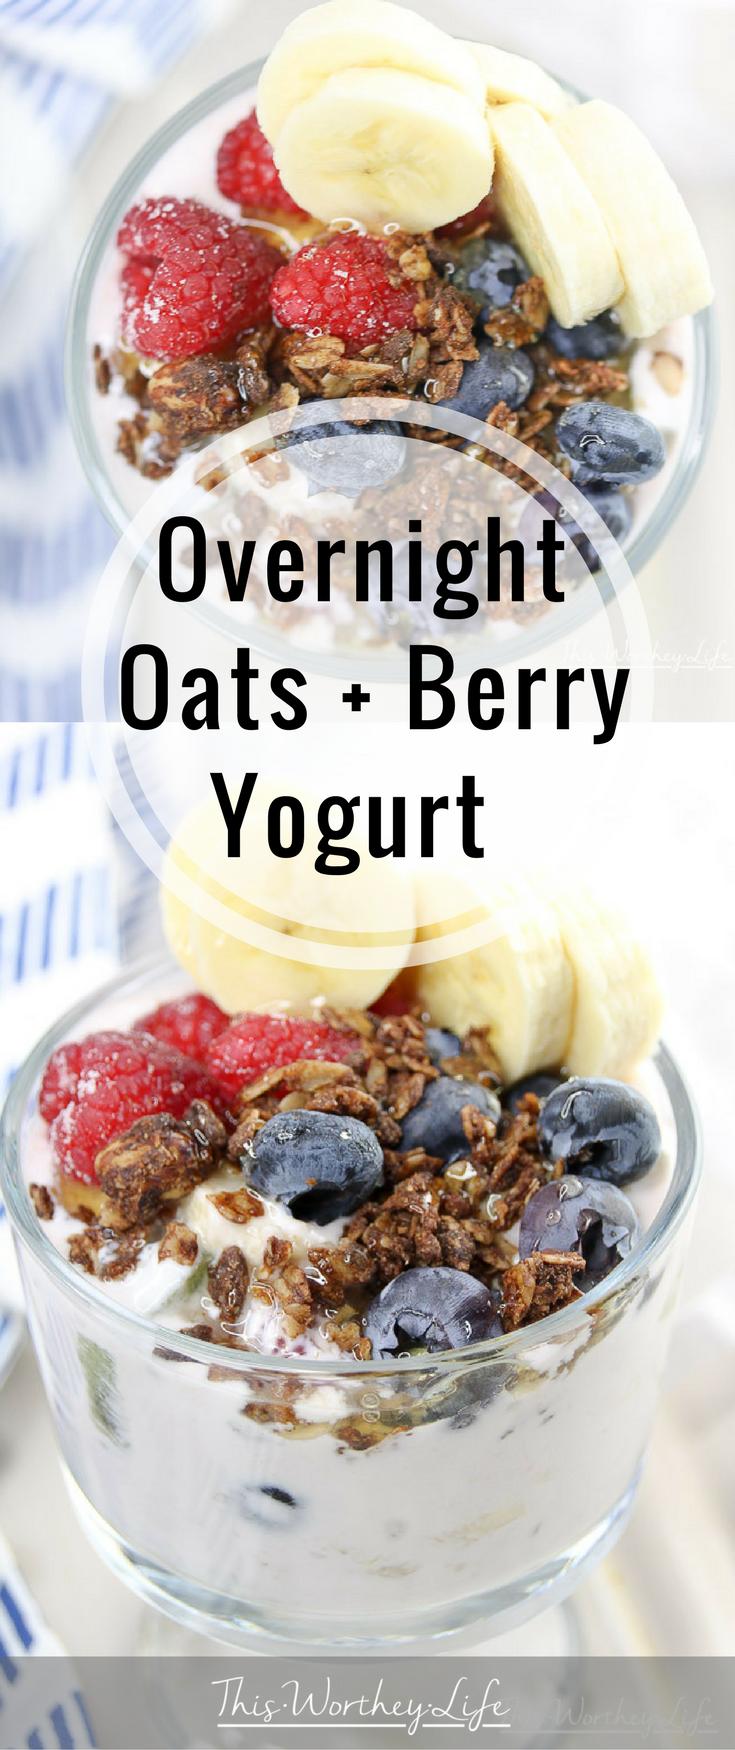 Overnight Oats + Berry Yogurt recipe